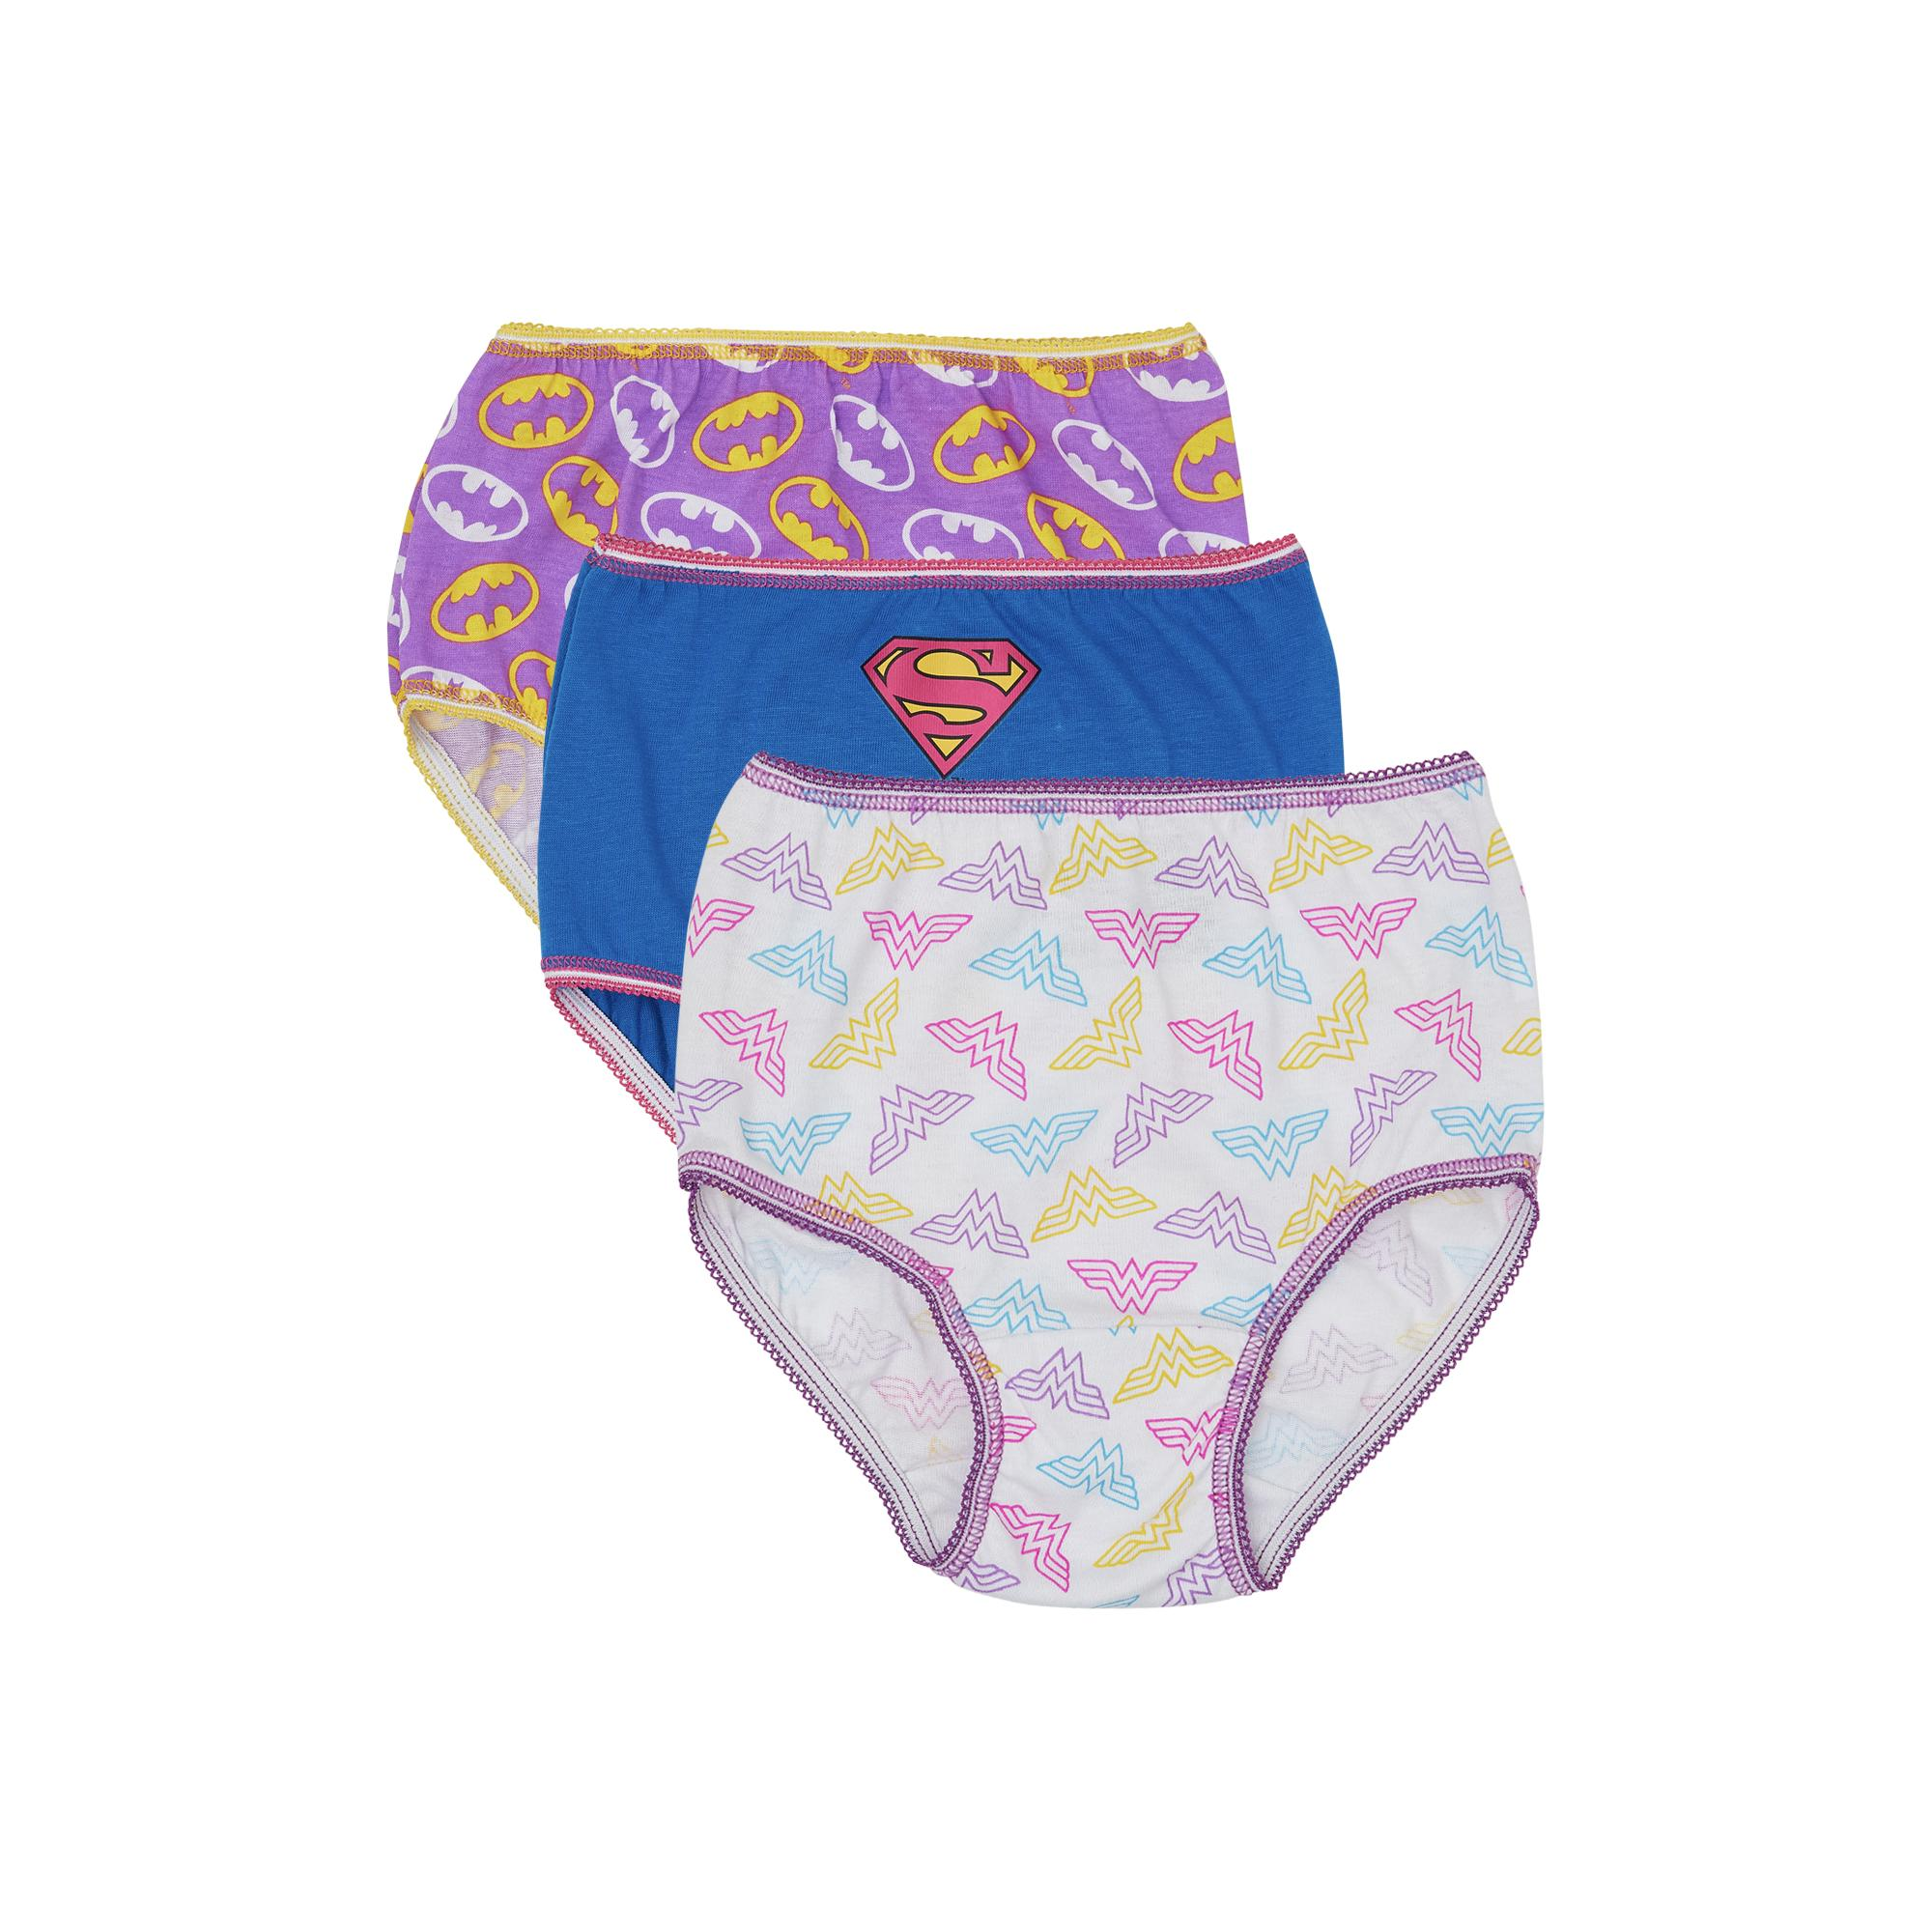 justice league underwear panties